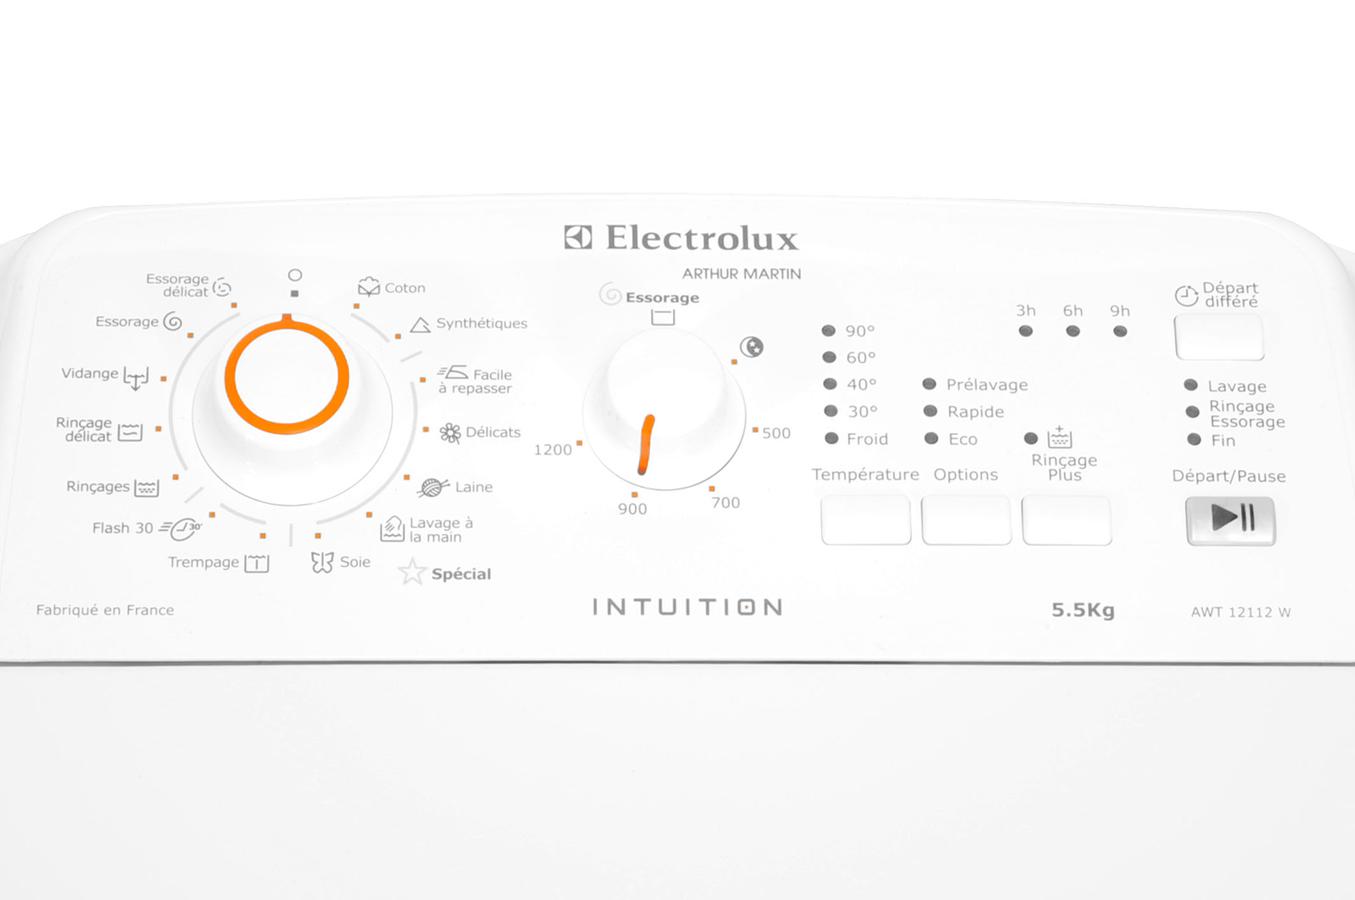 machine a laver electrolux intuition mode d emploi. Black Bedroom Furniture Sets. Home Design Ideas